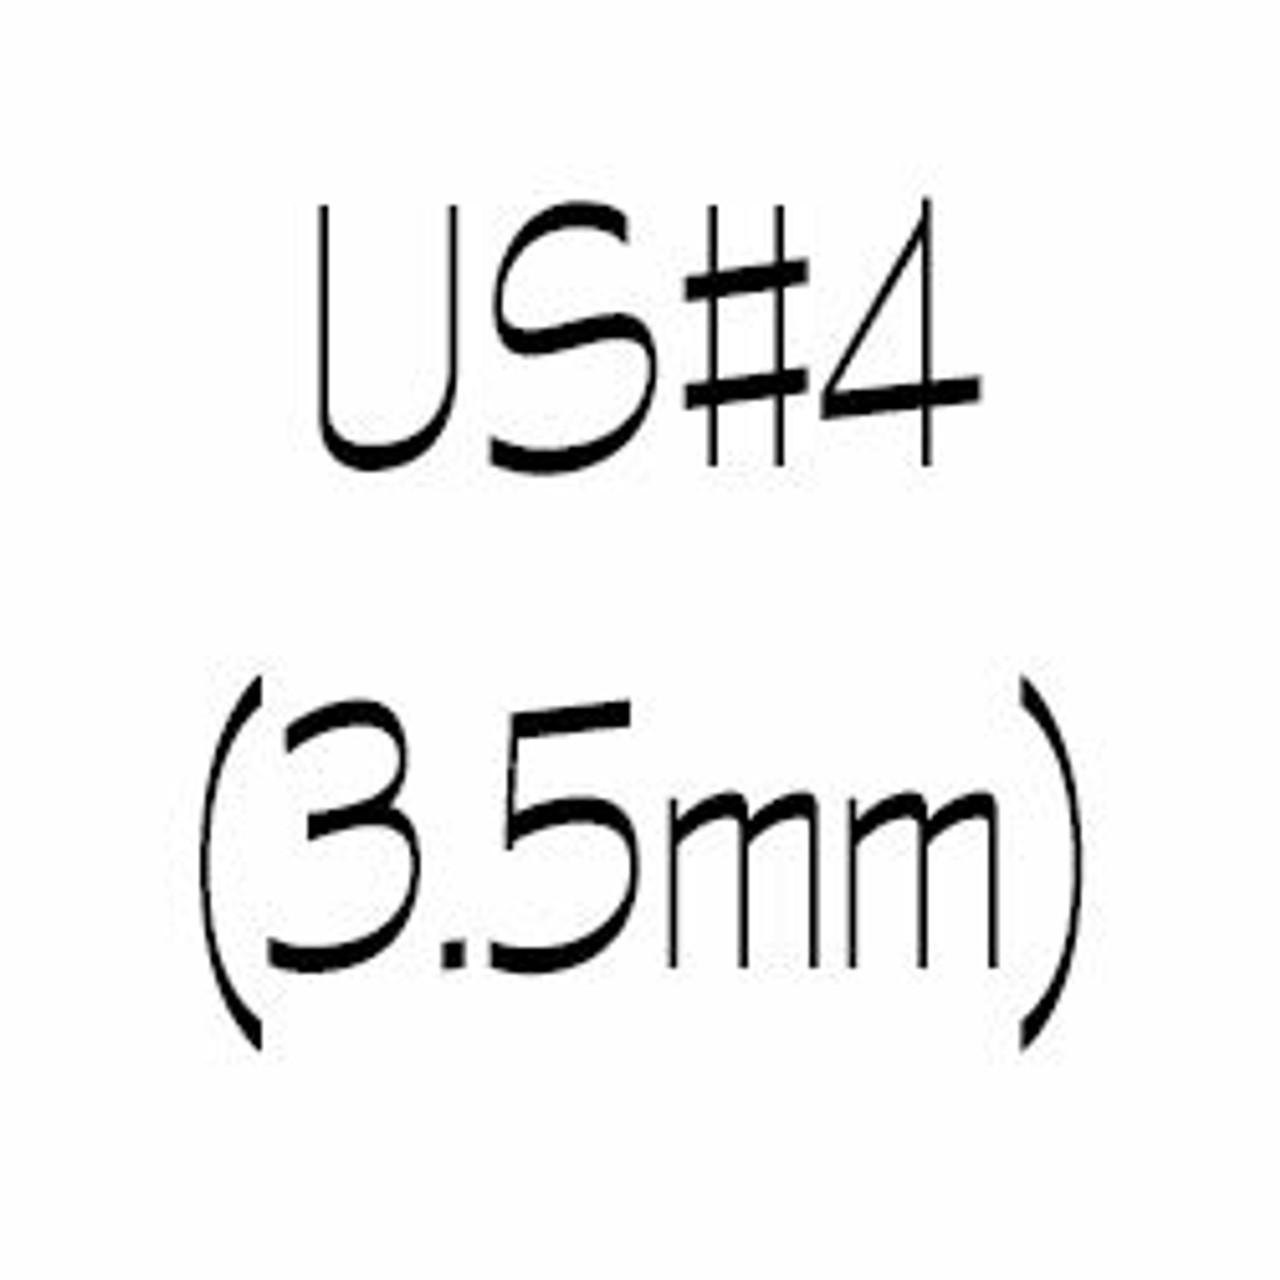 US#4 (3.5mm) circular knitting needles - Angelika's Yarn Store